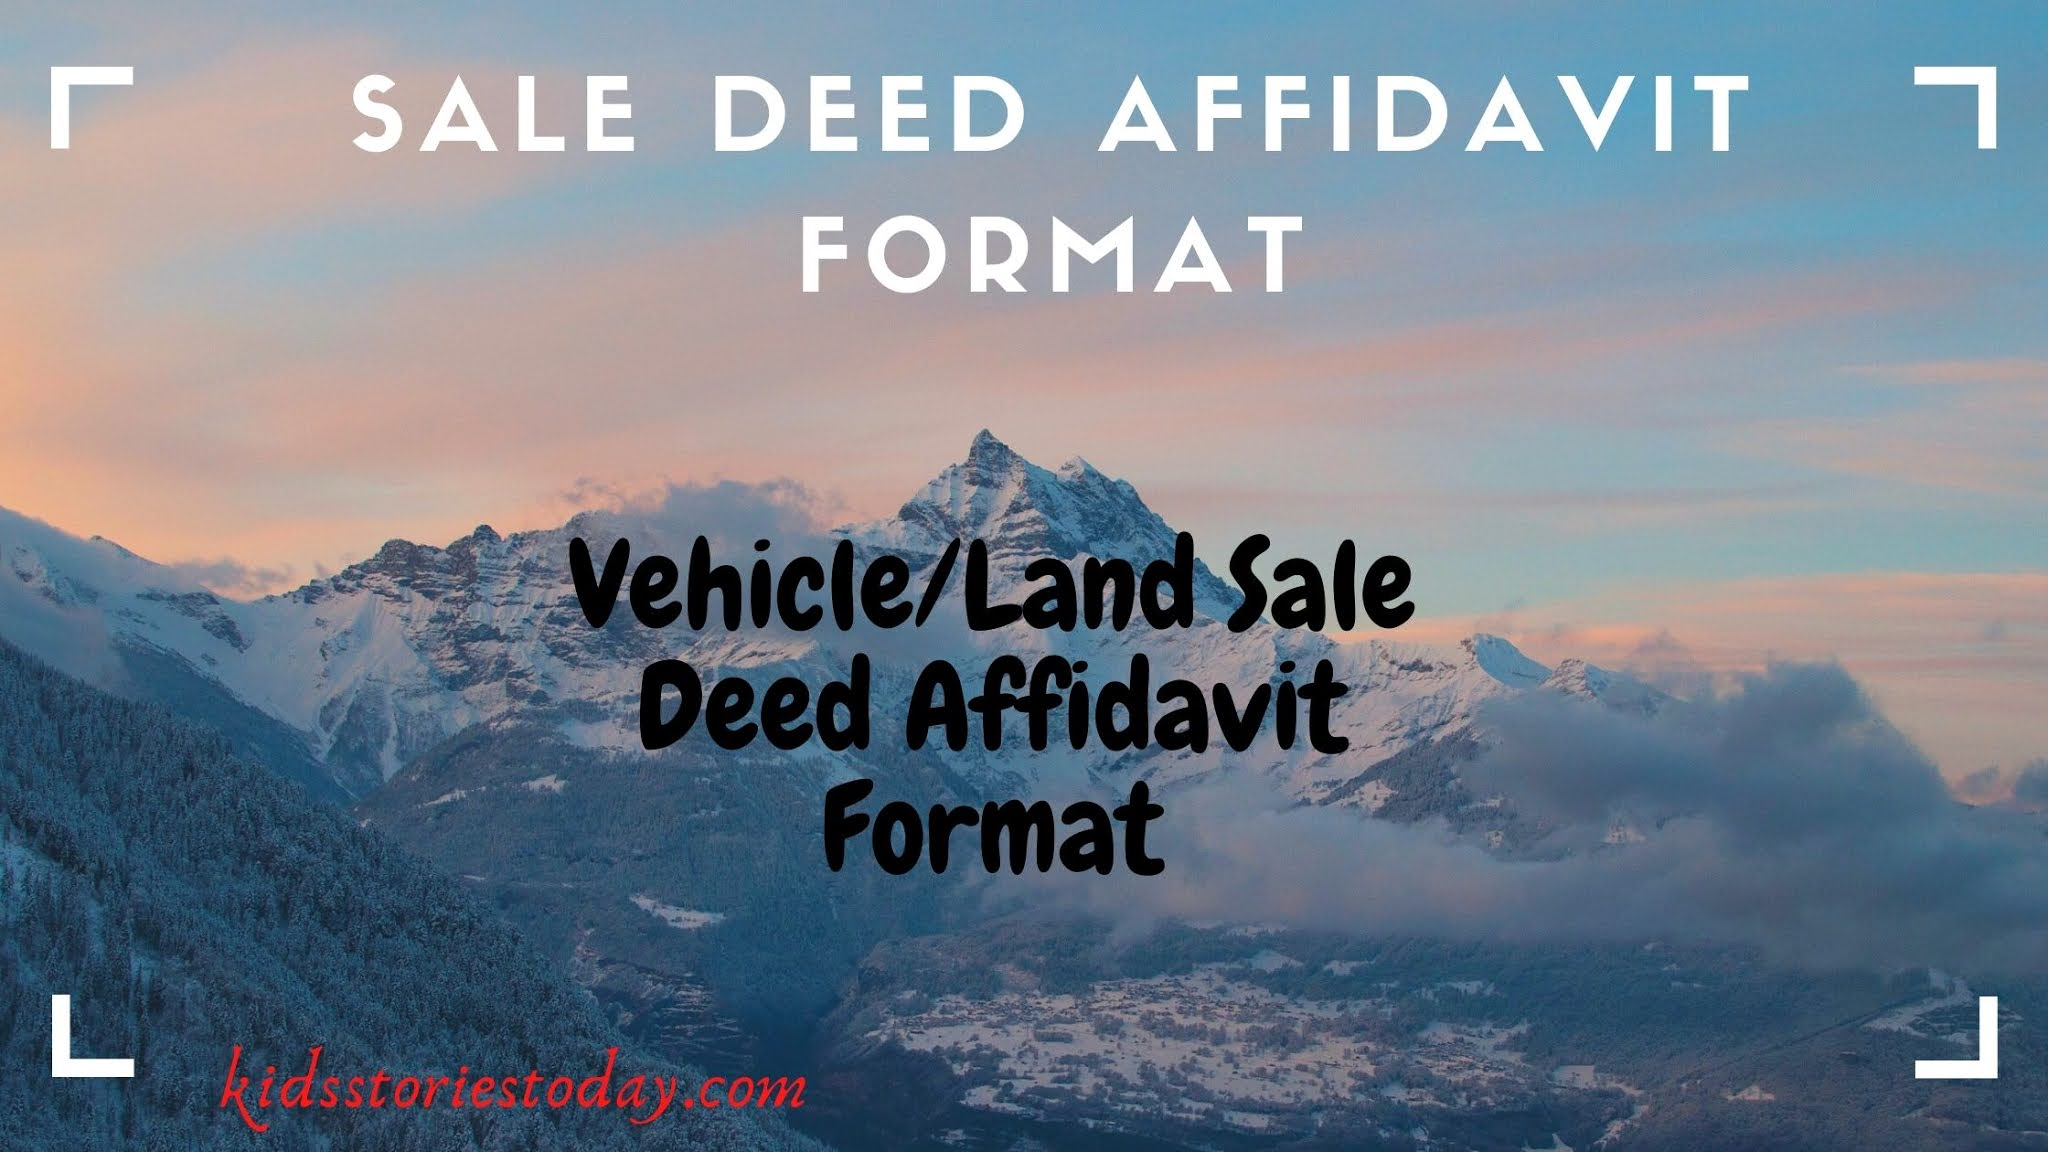 Vehicle/Land Sale Deed Affidavit Format